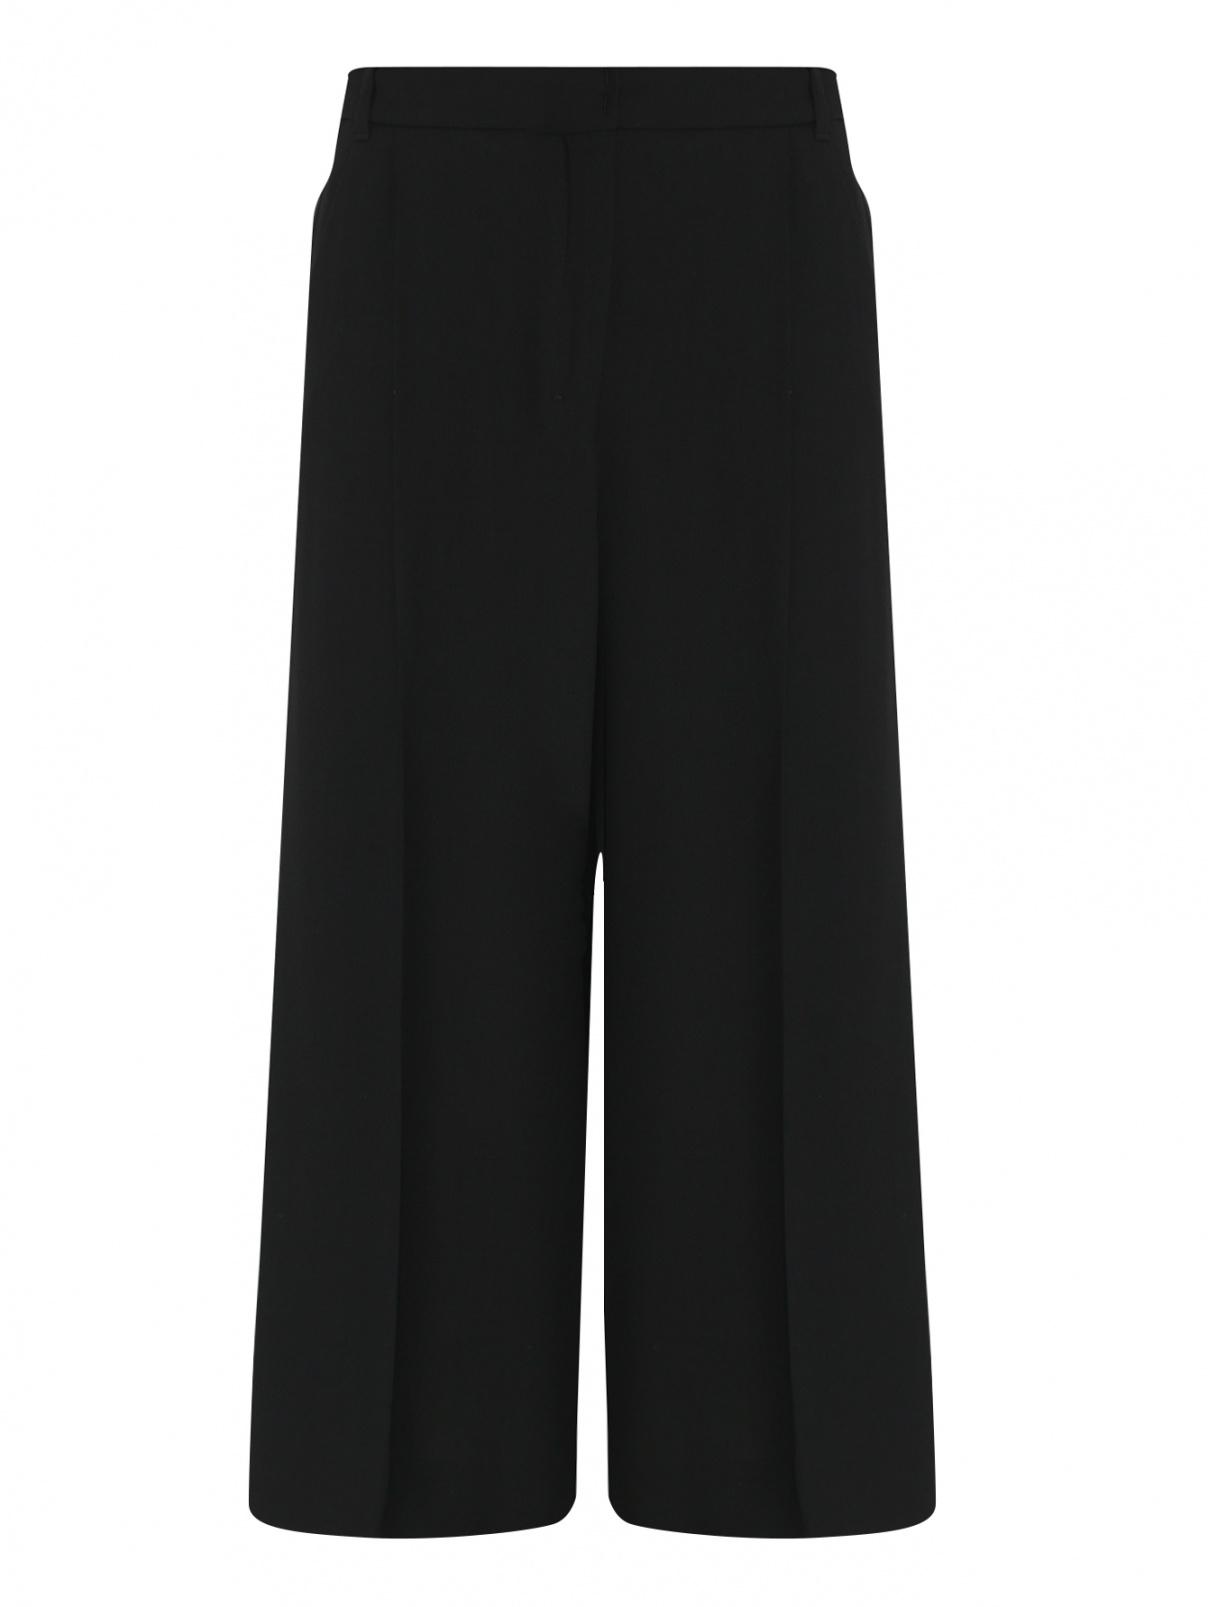 Широкие брюки с карманами Max Mara  –  Общий вид